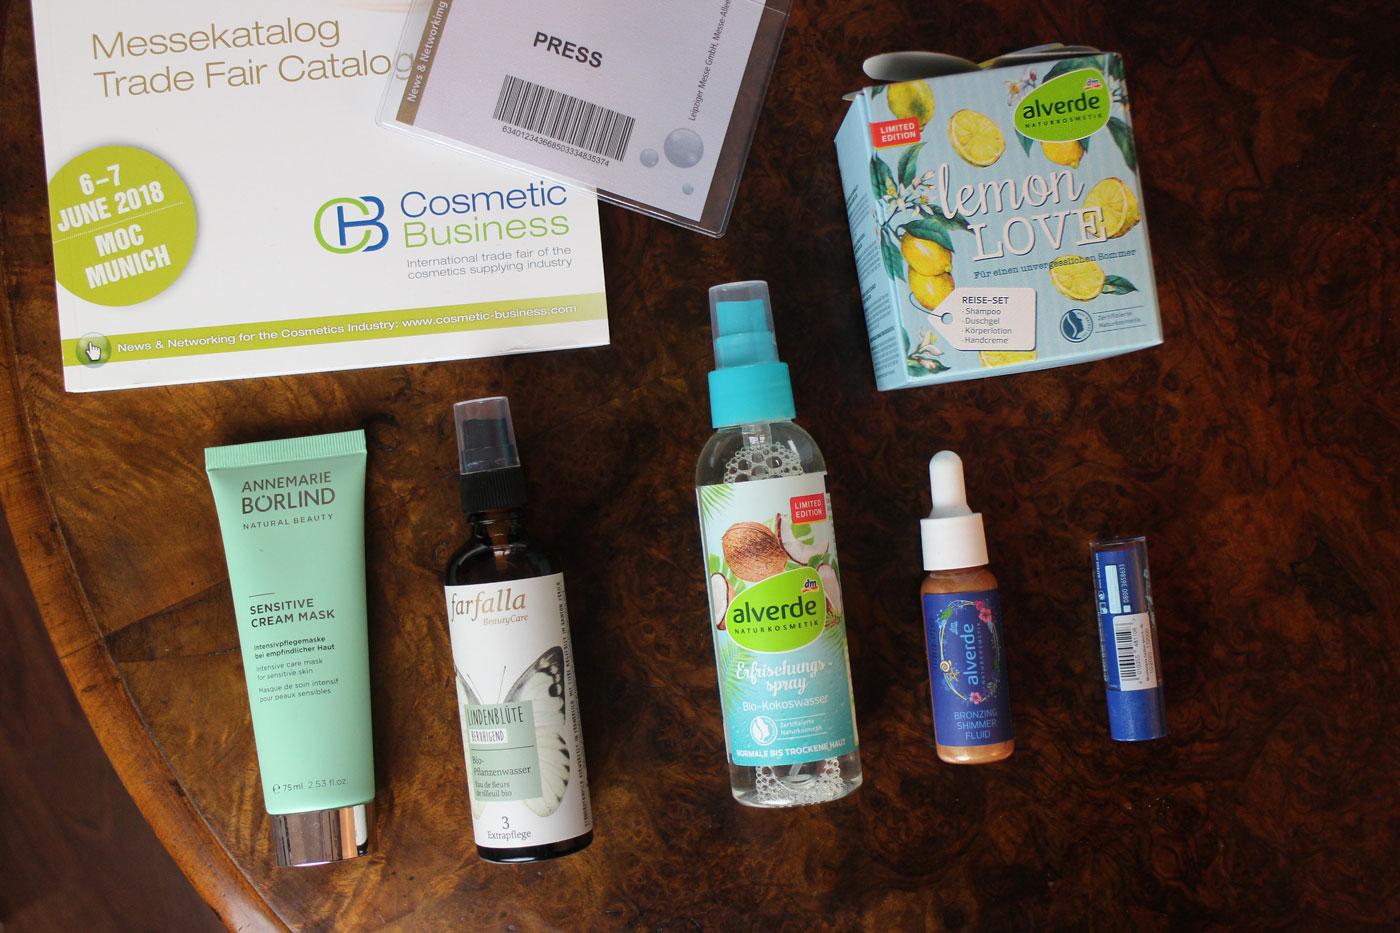 Ntaurkosmetik und CosmeticBusiness